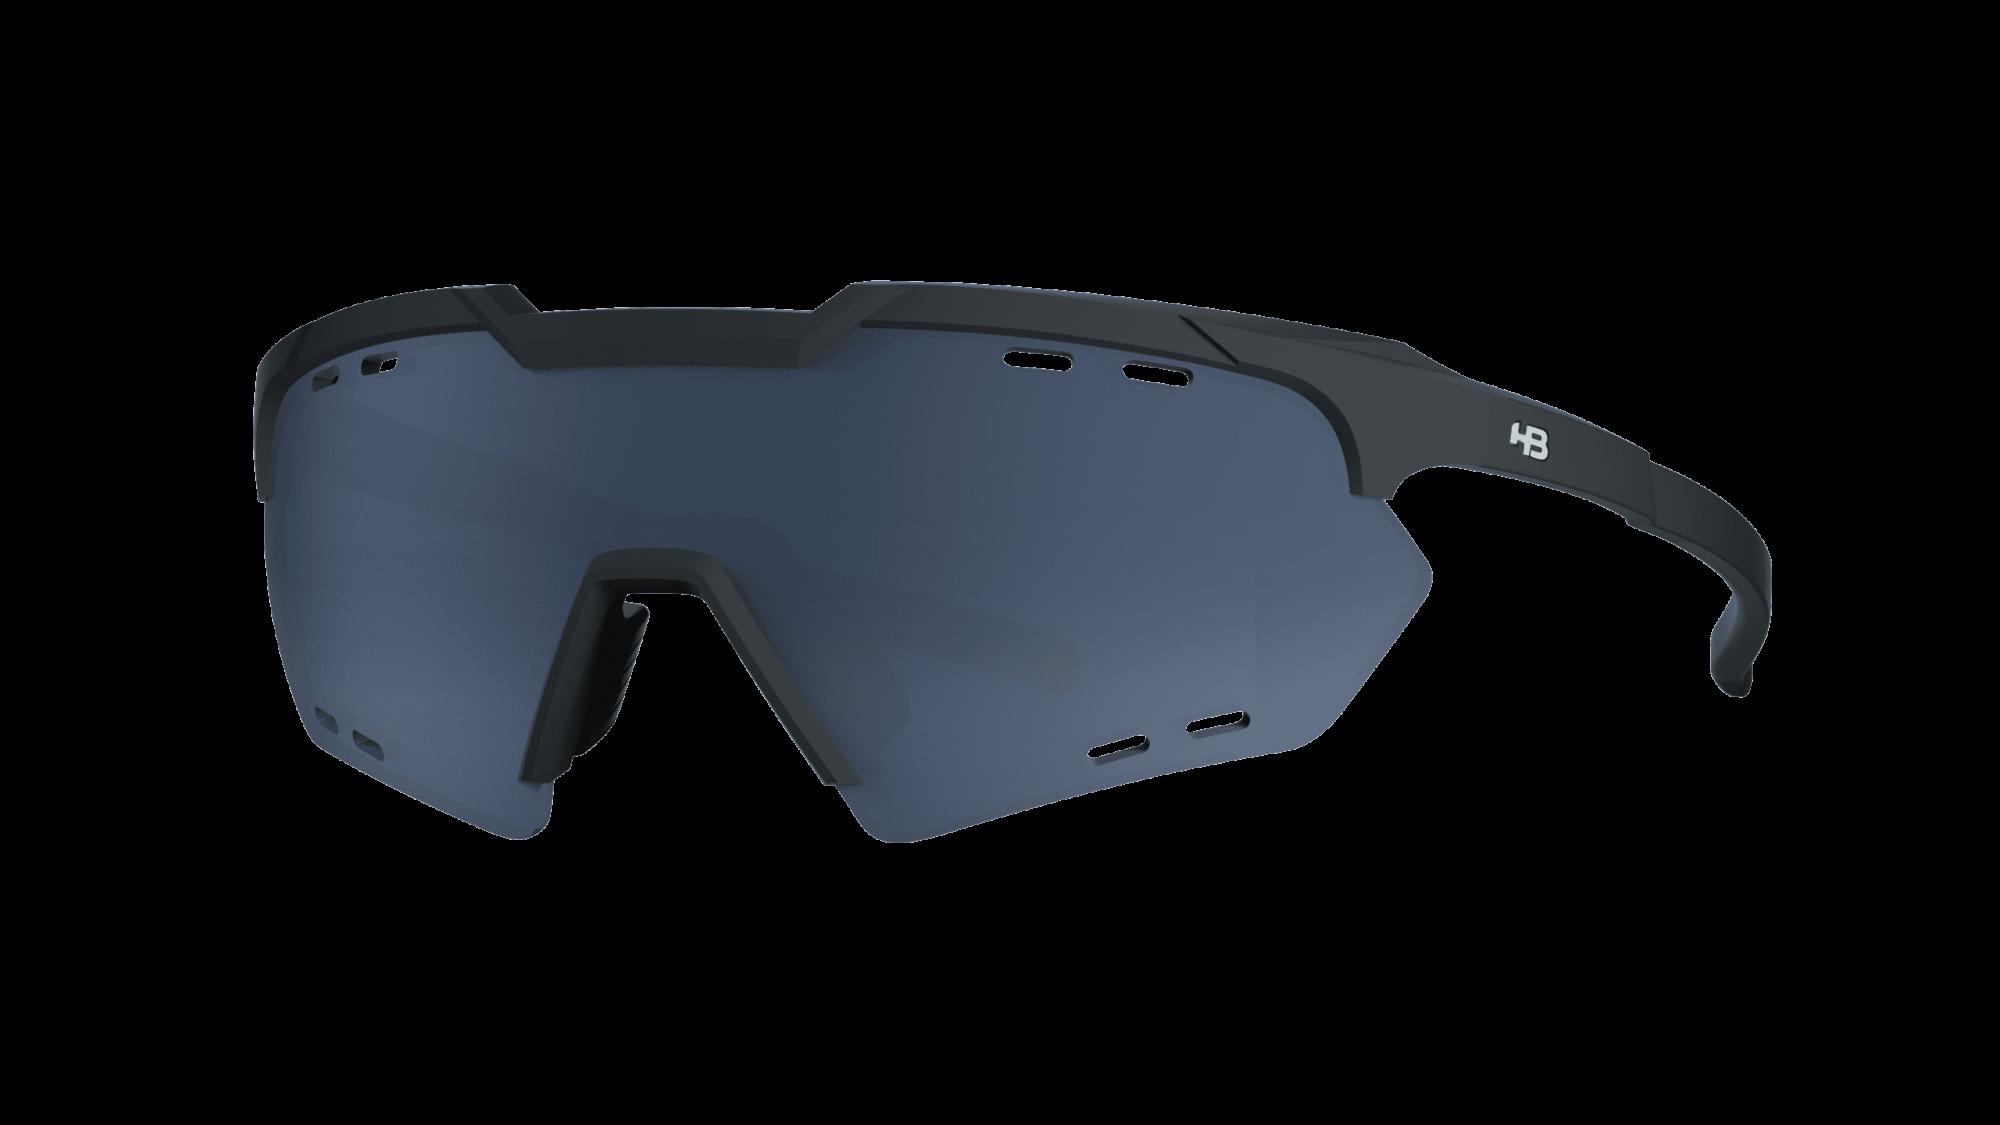 Óculos Shield Compact Small Road Matte Black Gray